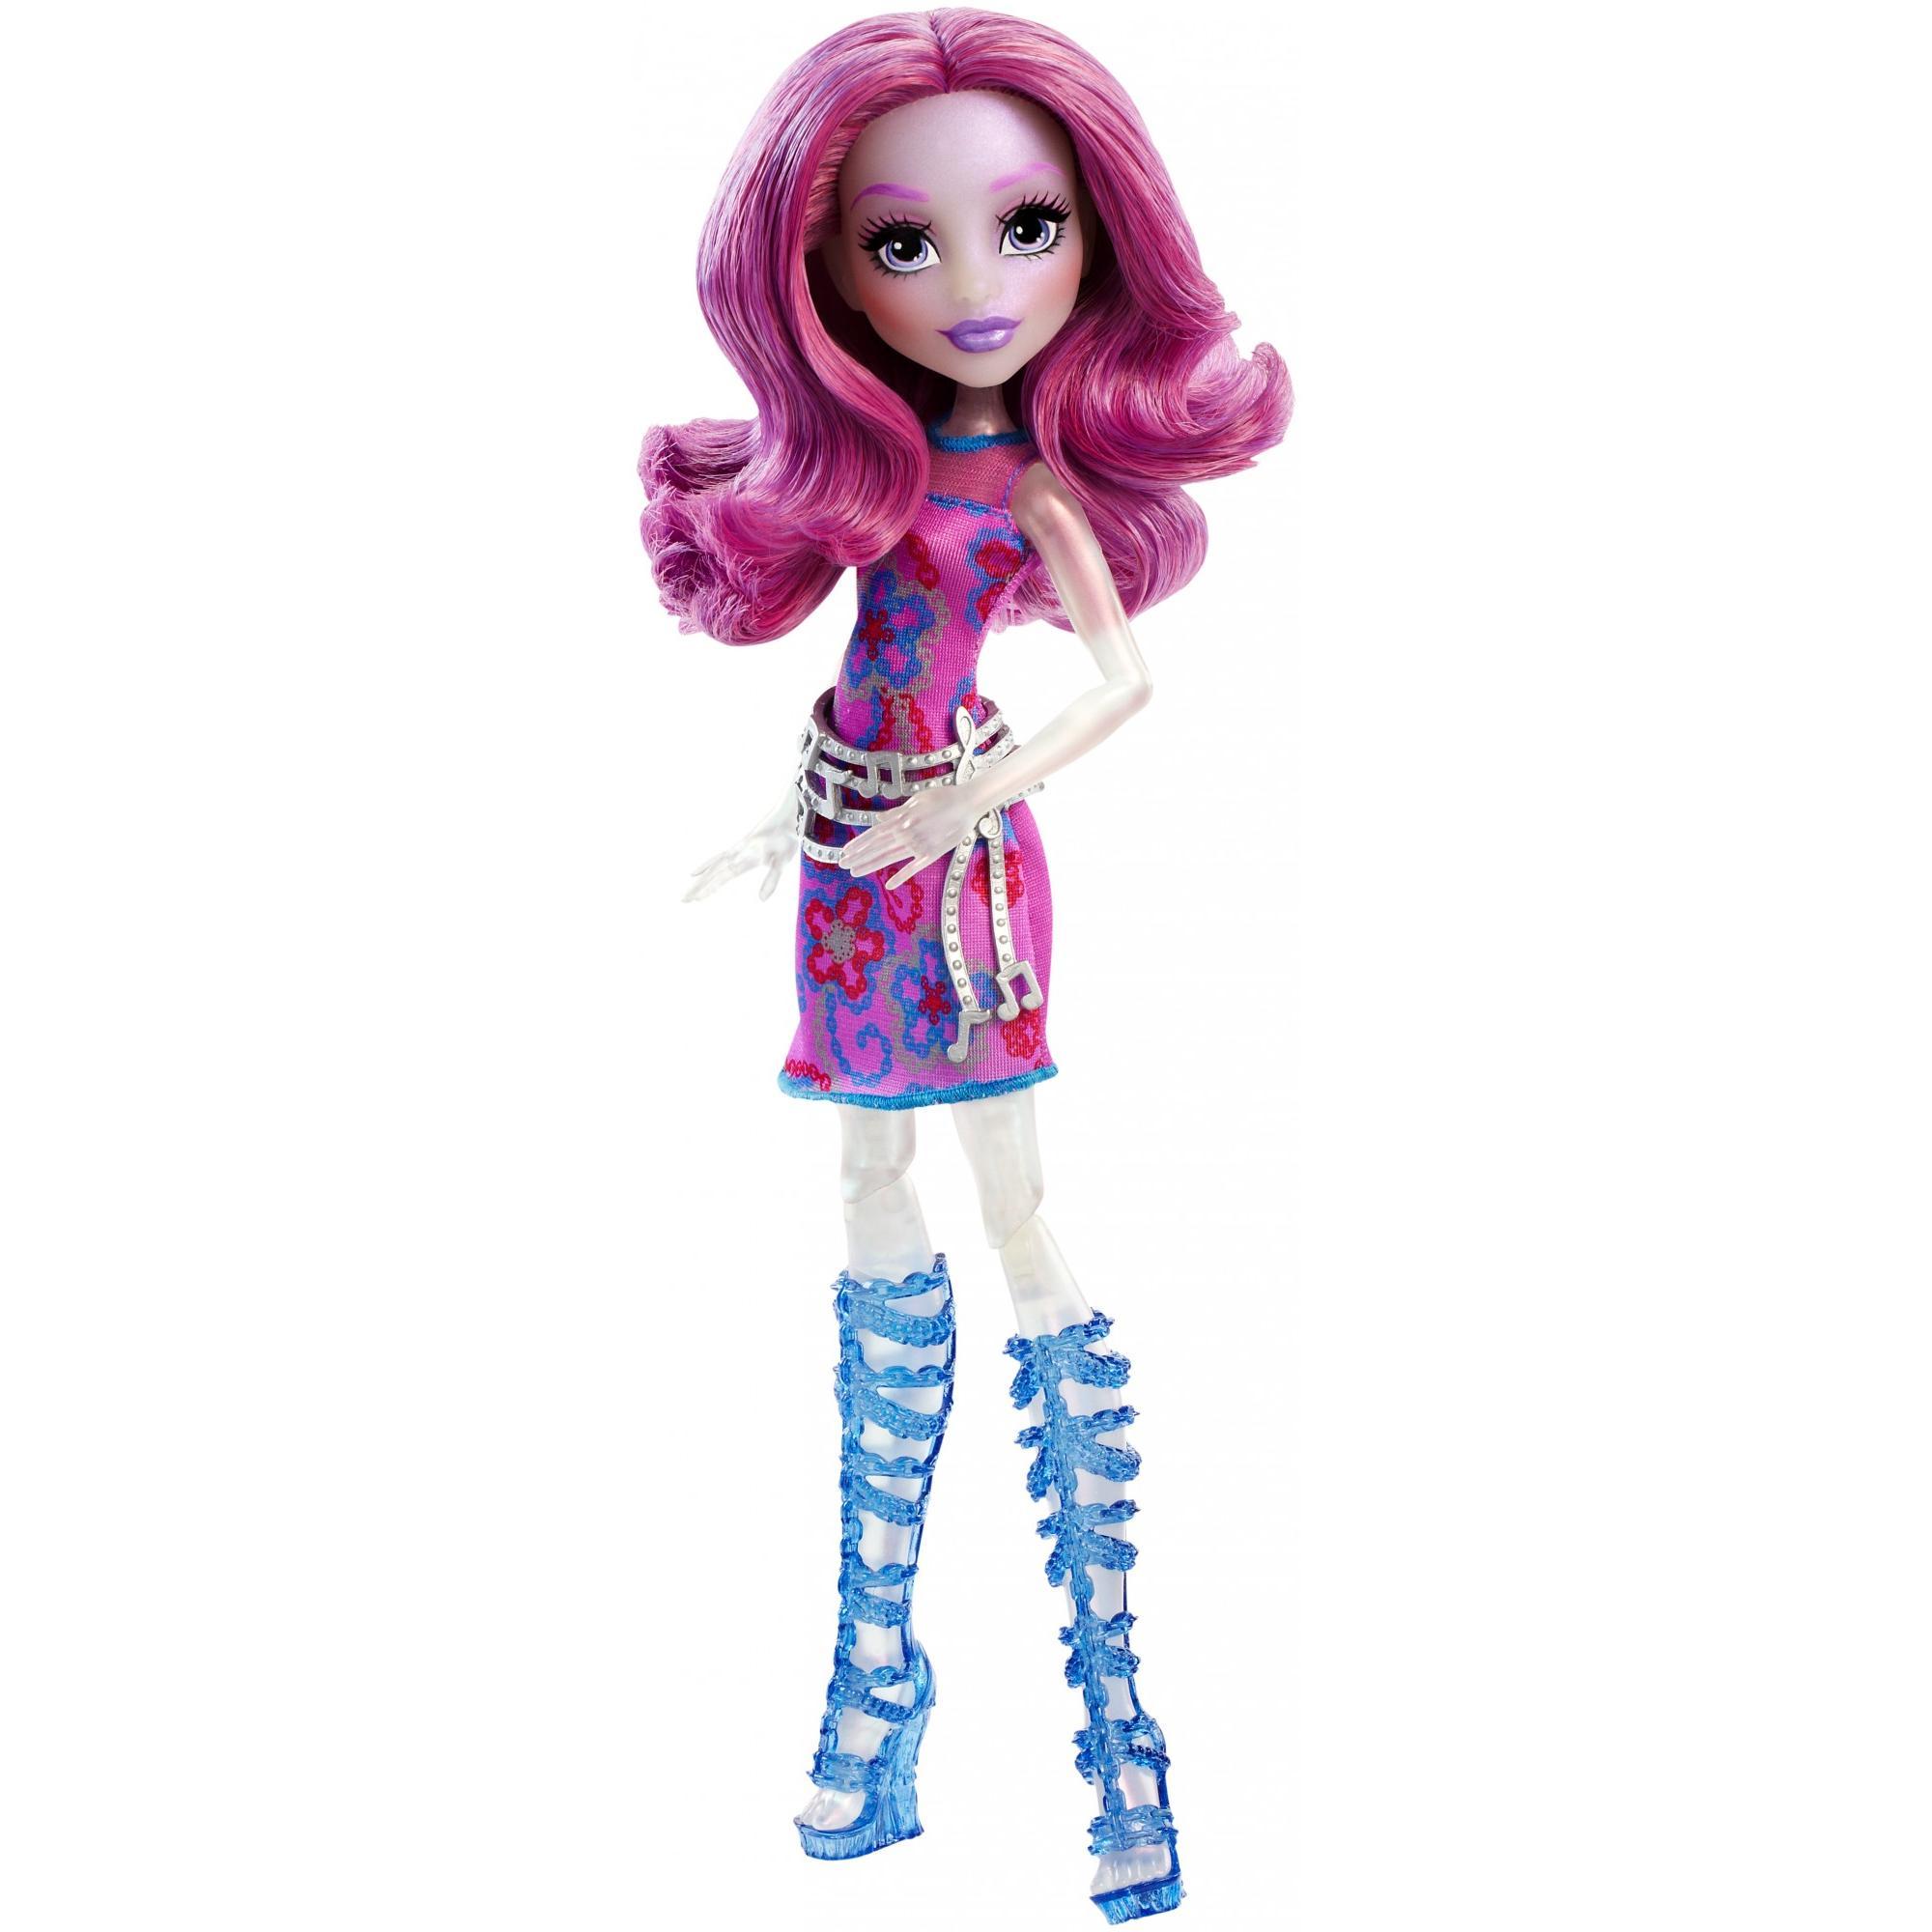 Monster High Welcome To Monster High Popstar Ari Hauntington Doll